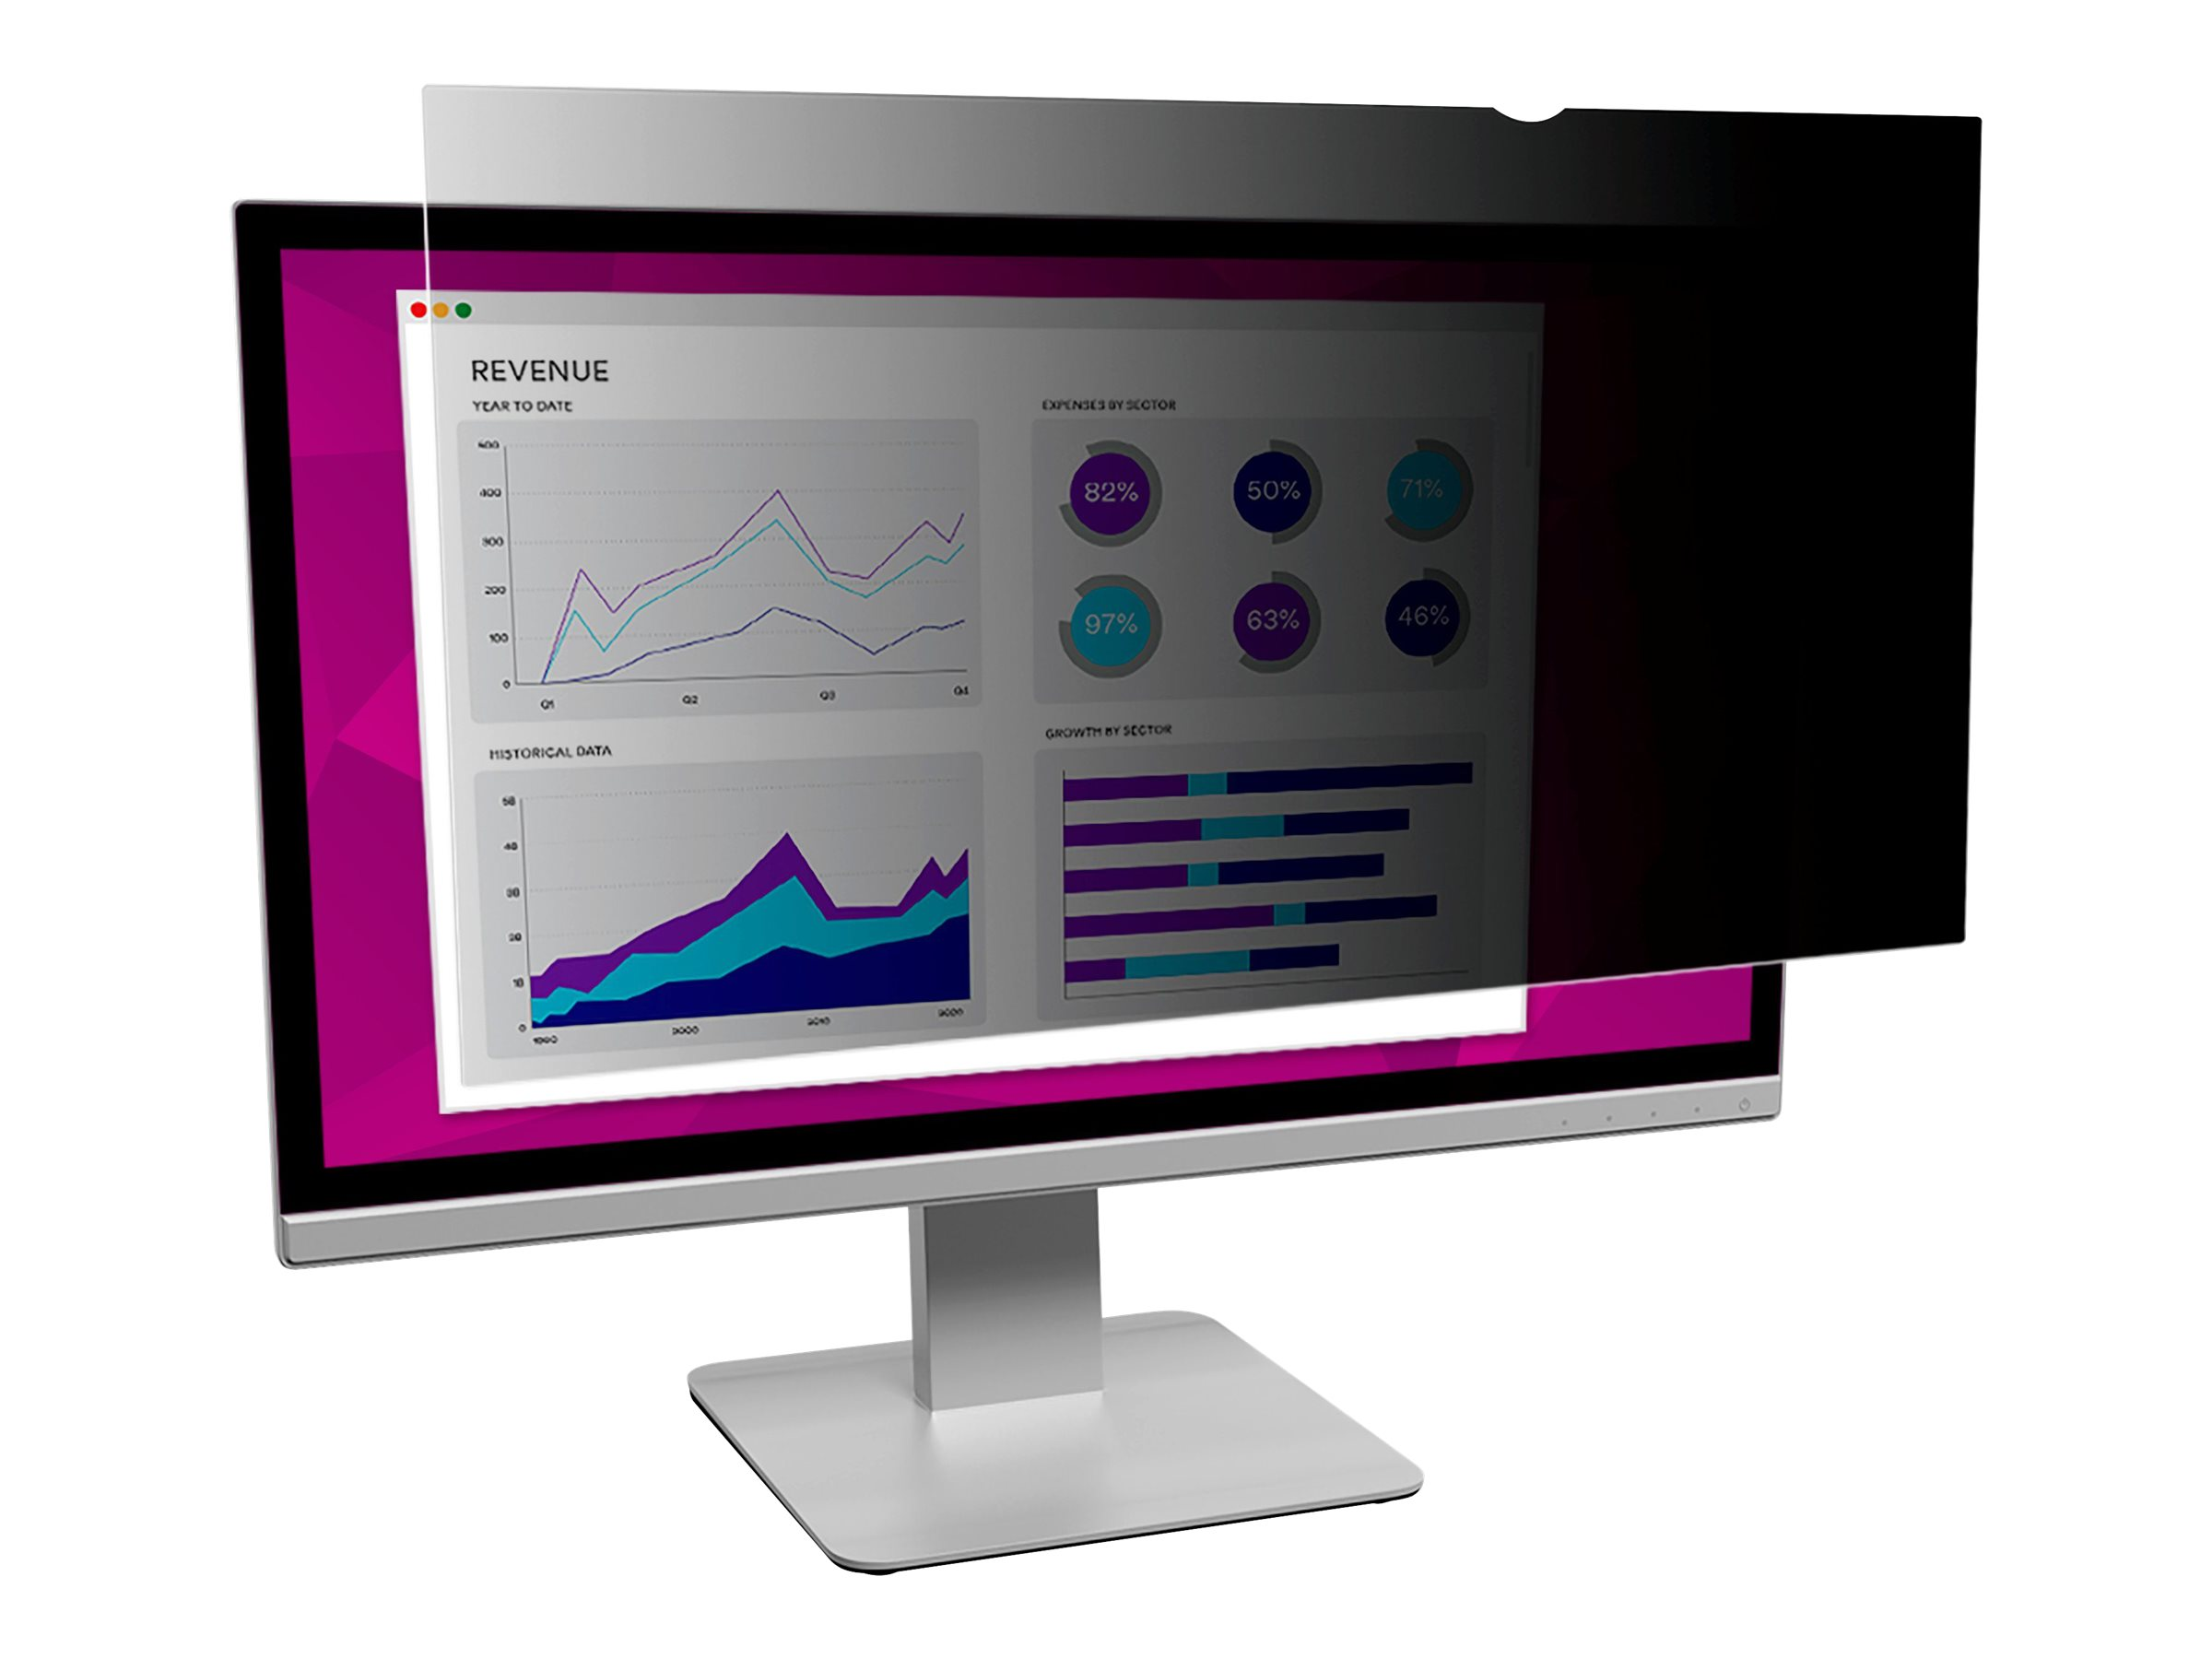 "3M Blickschutzfilter High Clarity für 27"" Breitbild-Monitor - Blickschutzfilter für Bildschirme - 68,6 cm Breitbild (27 Zoll Breitbild)"